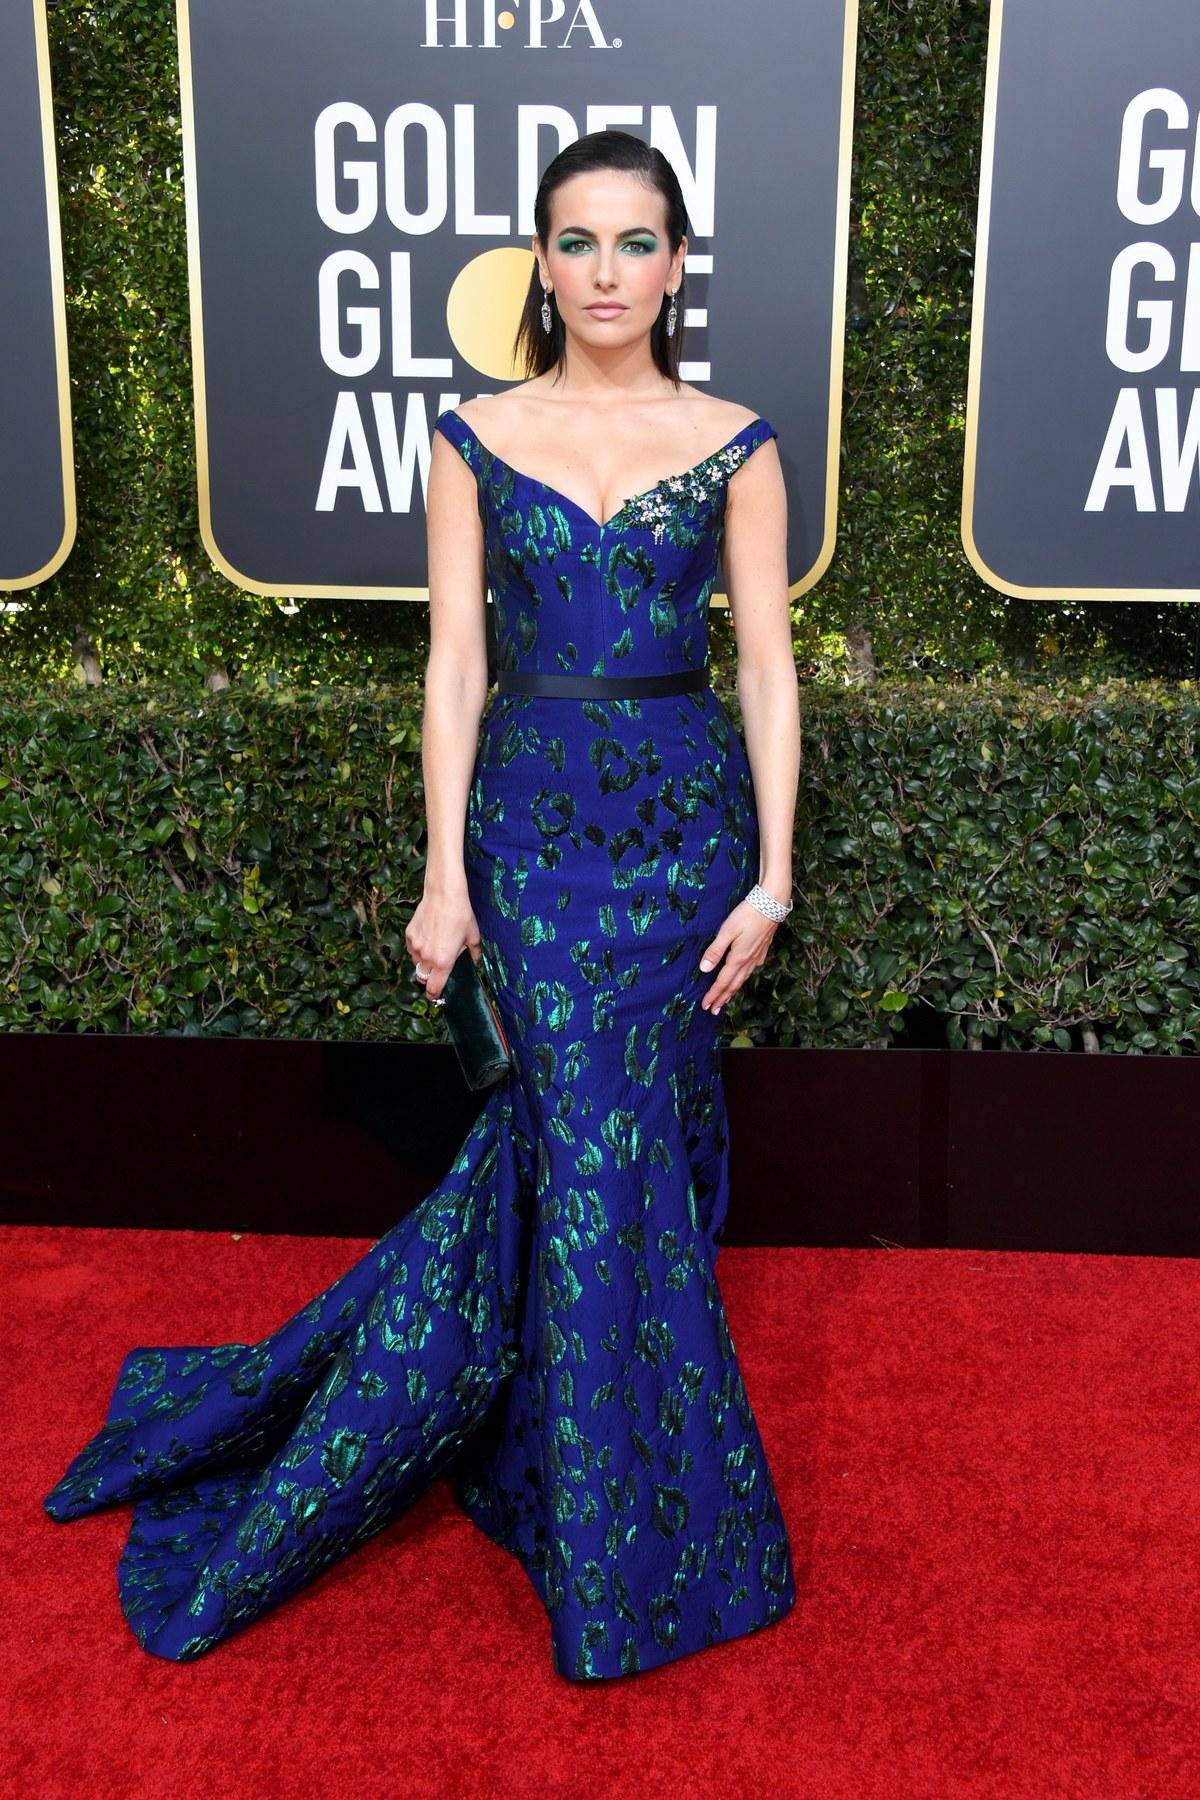 Camilla Belle wearing Jason Wu Golden Globes